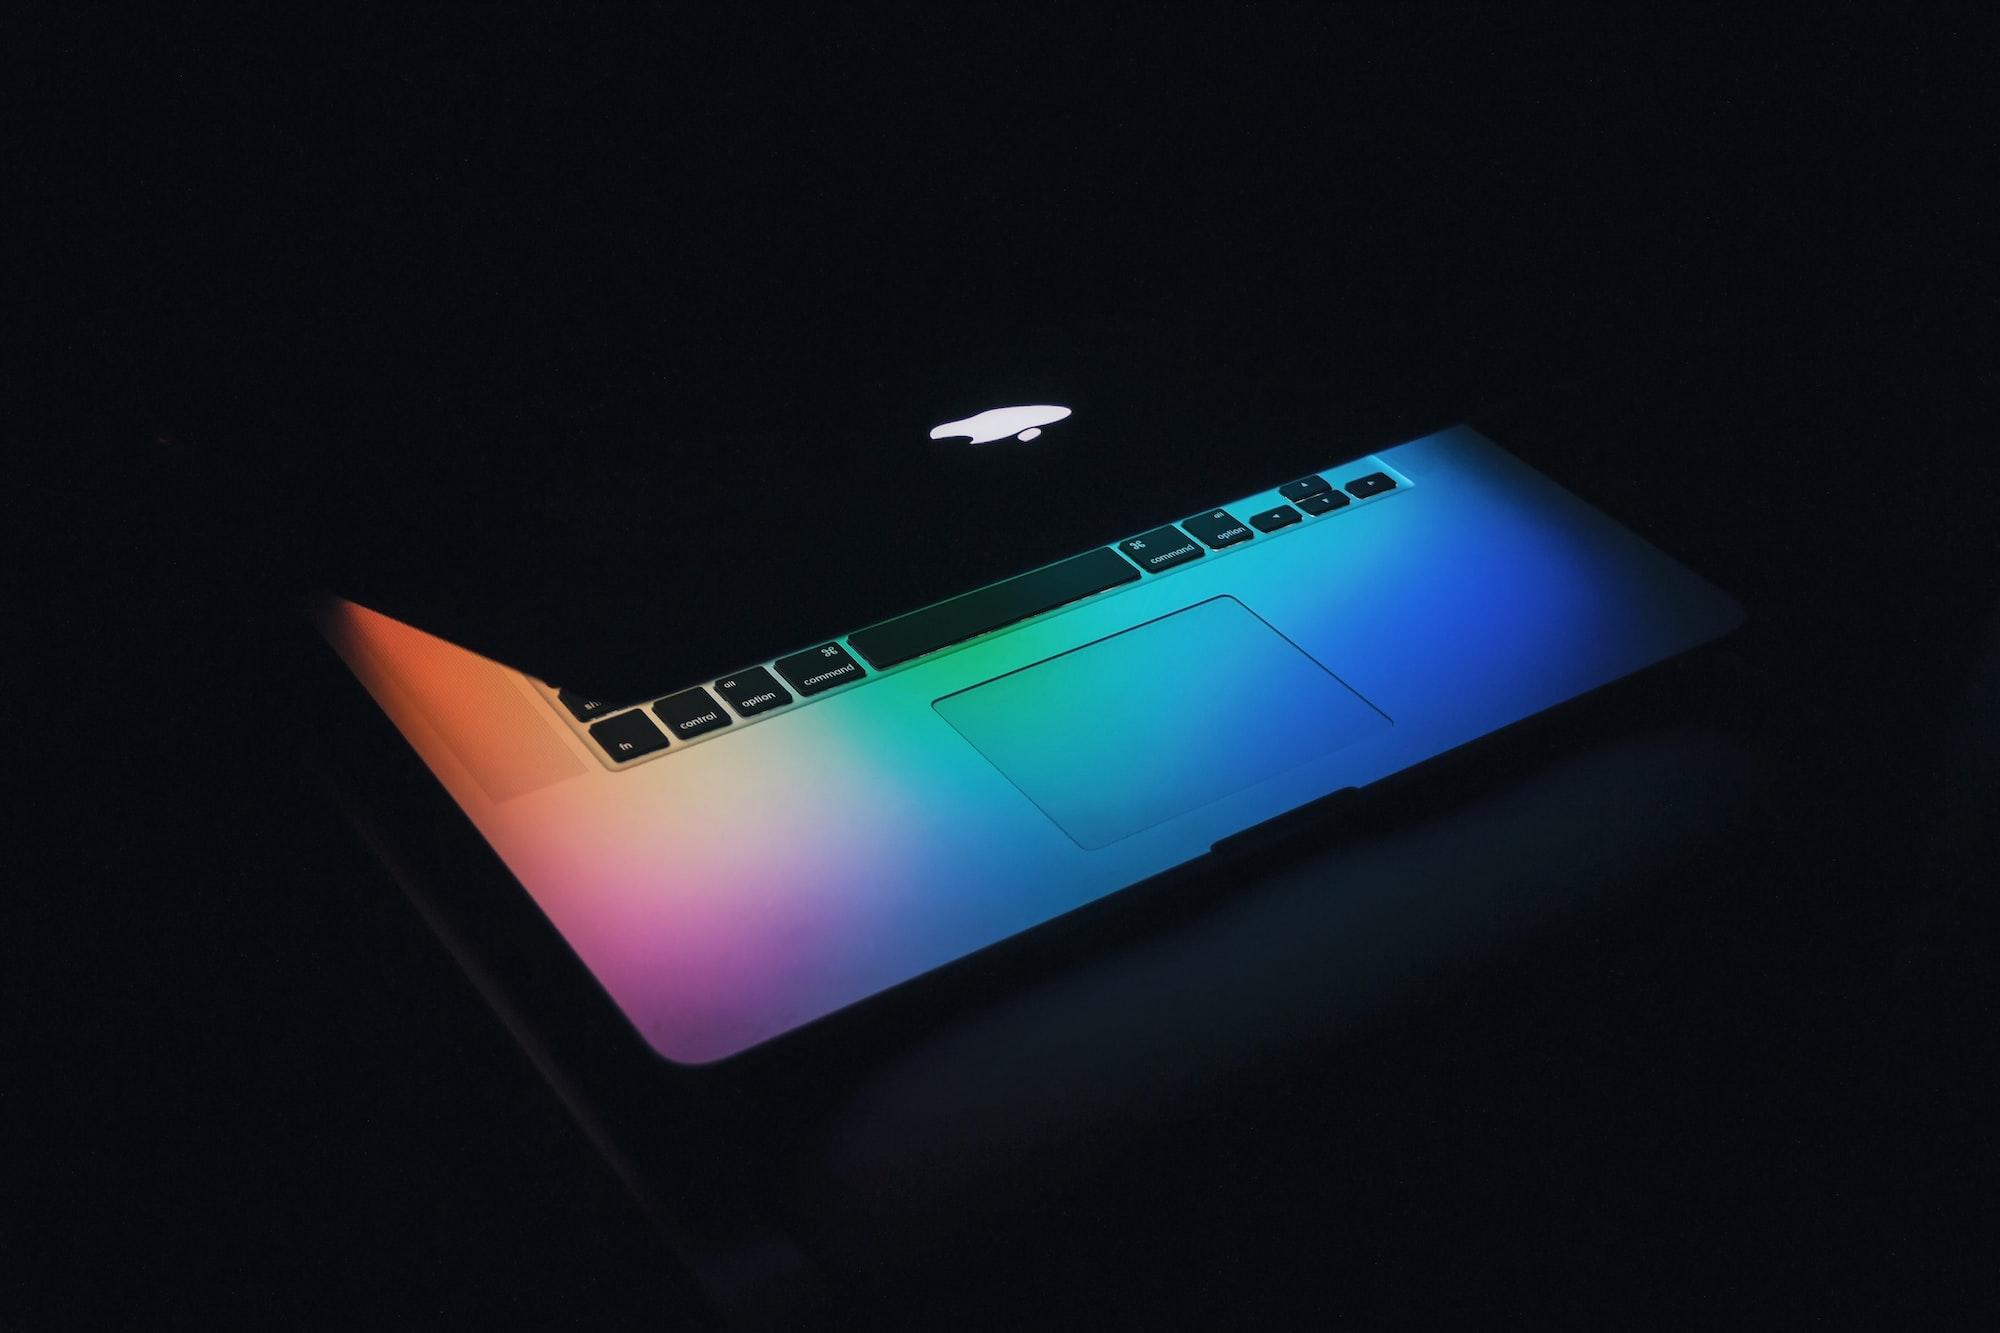 Colorful MacBook keyboard